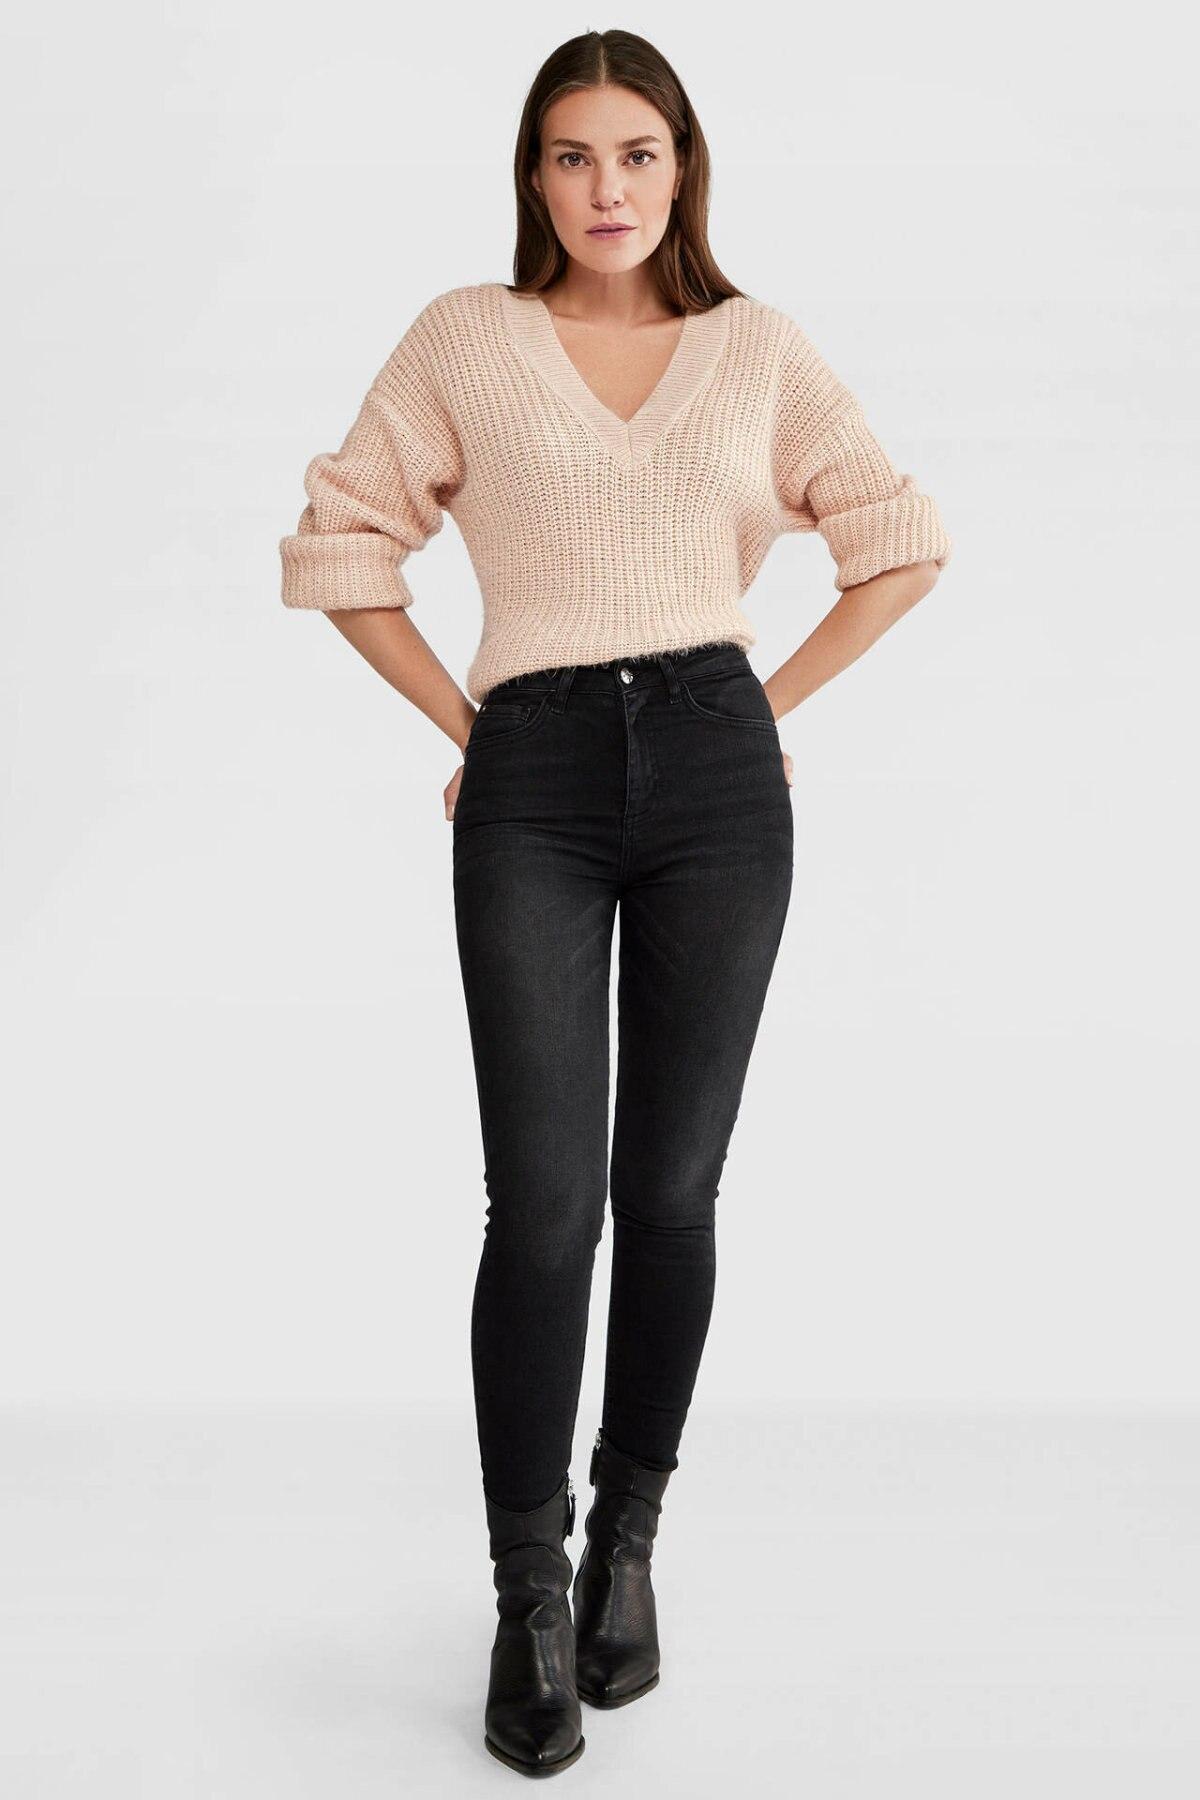 DeFacto Women Fashion Black Jean Trousers Female High Waist Elastic Denim Female Skinny Pencil Pants Ladies- L8027AZ19AU